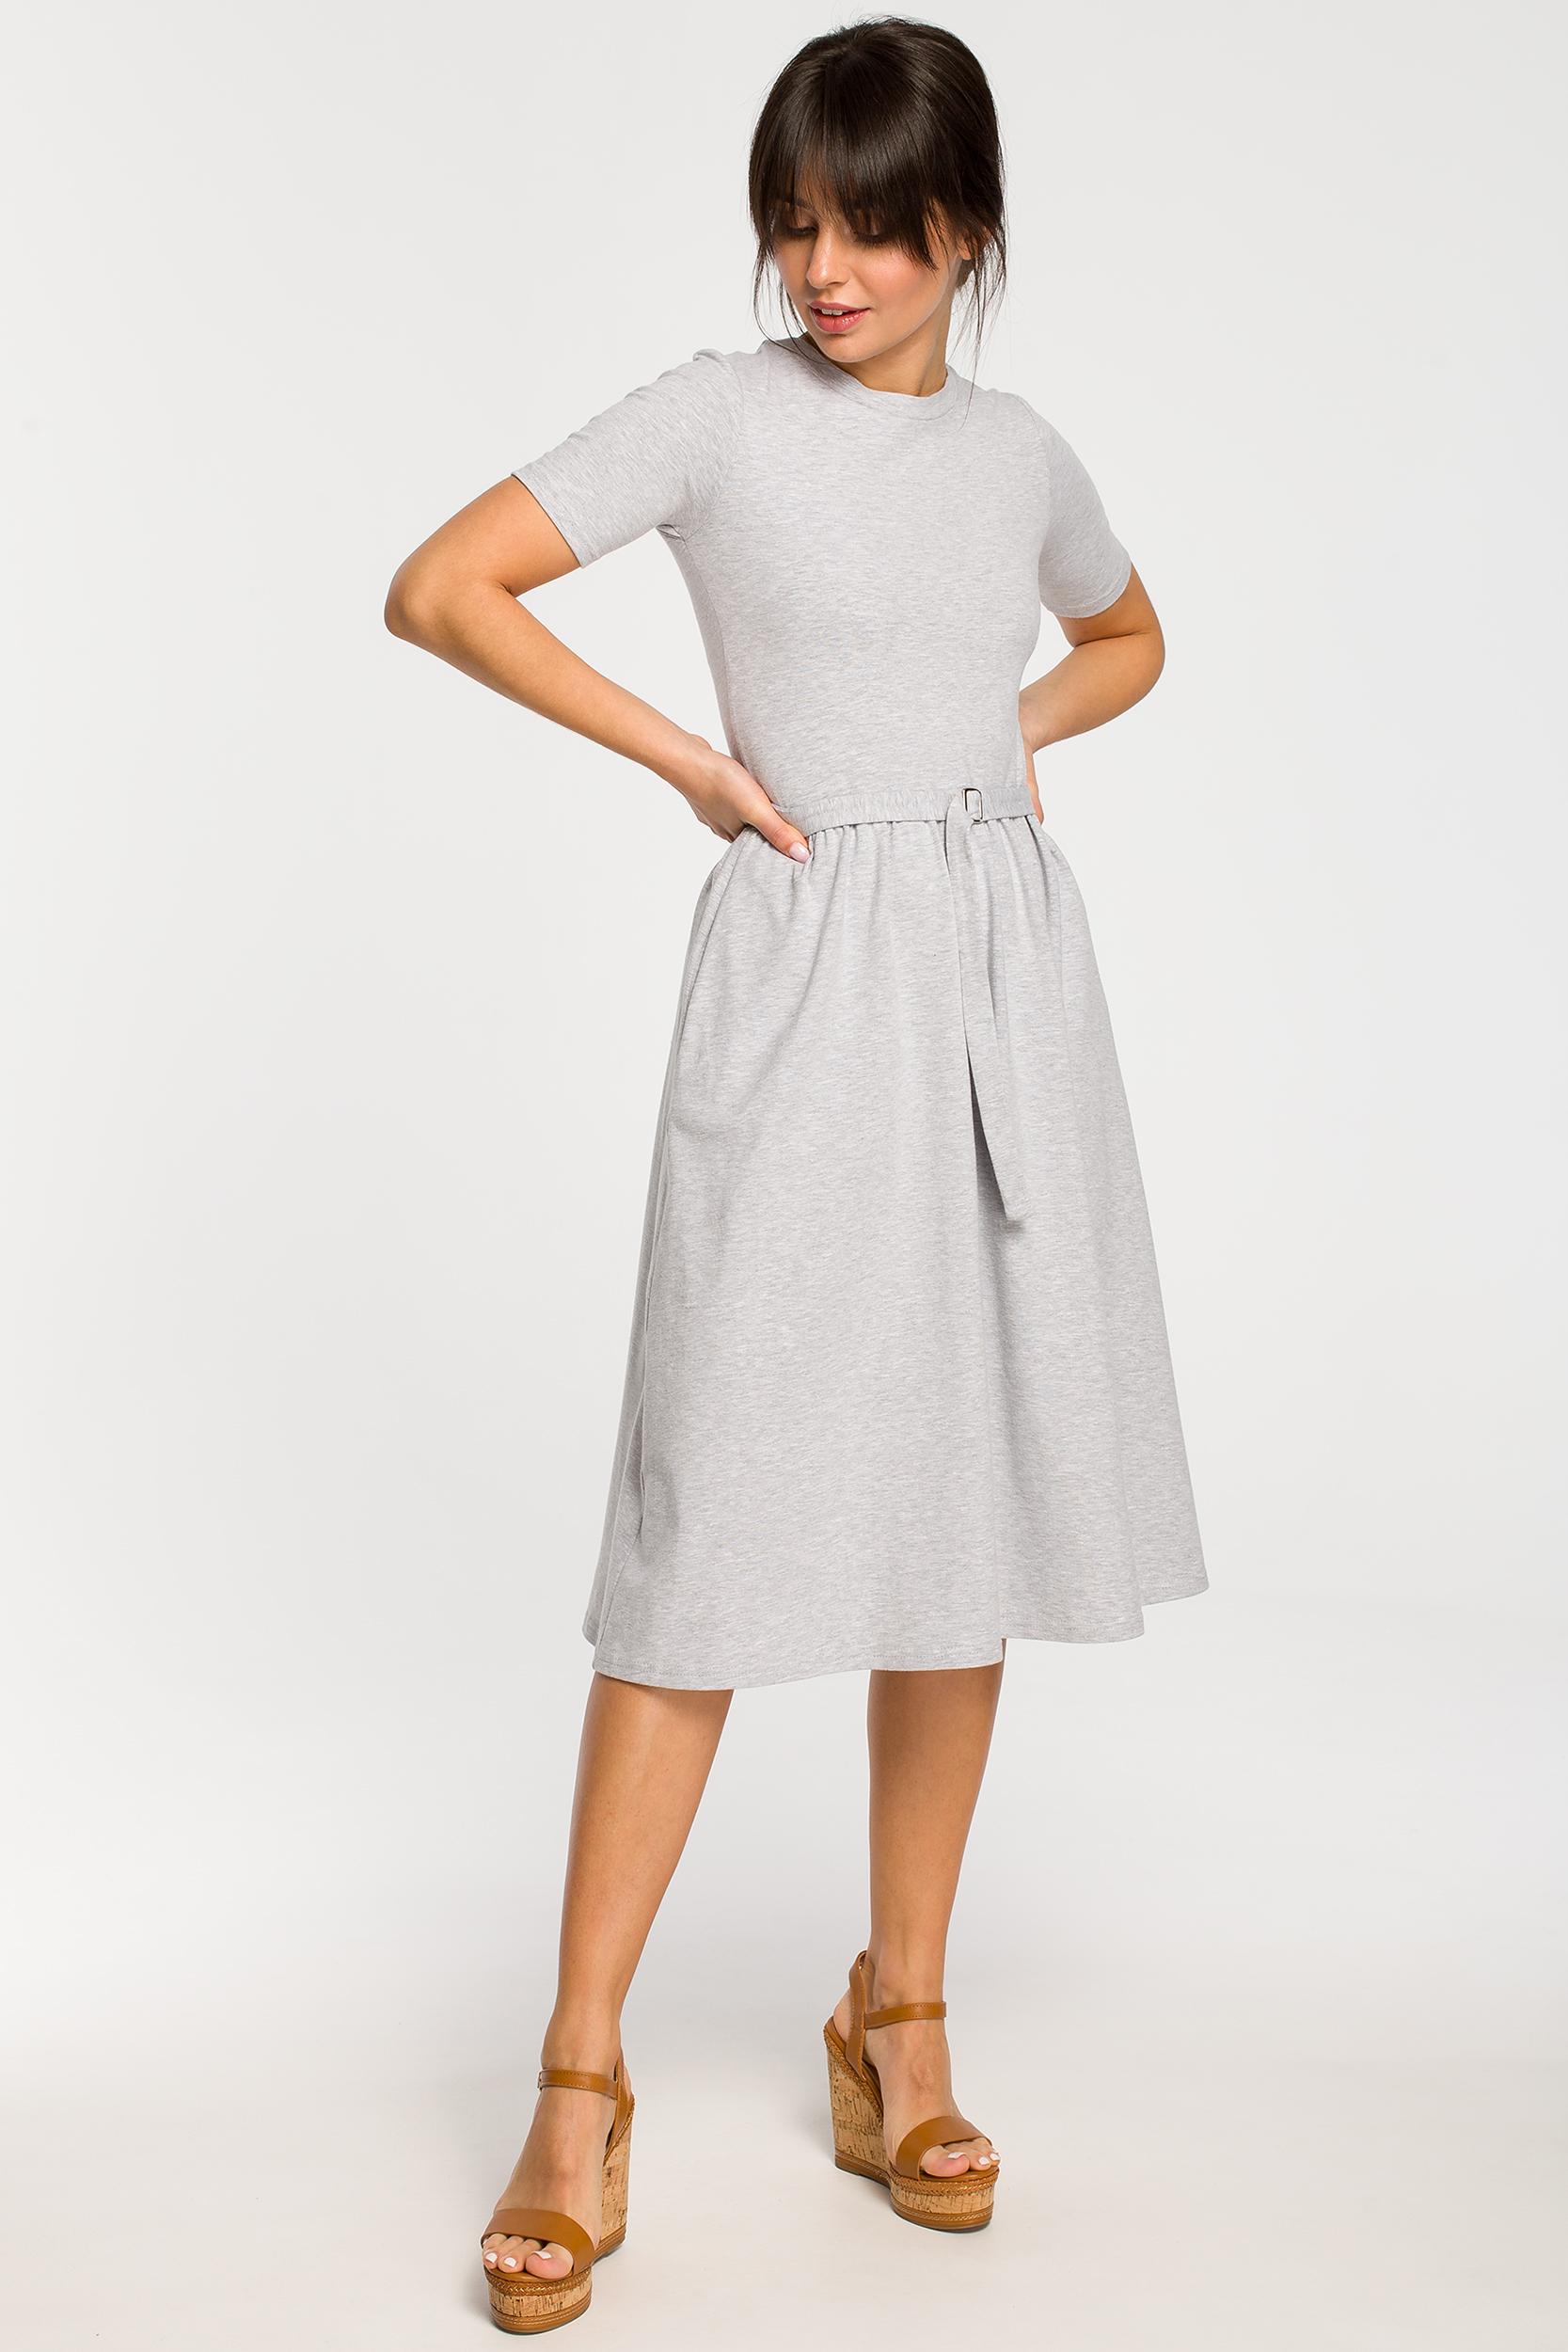 CM4268 Sukienka z paskiem i klamerką - szara